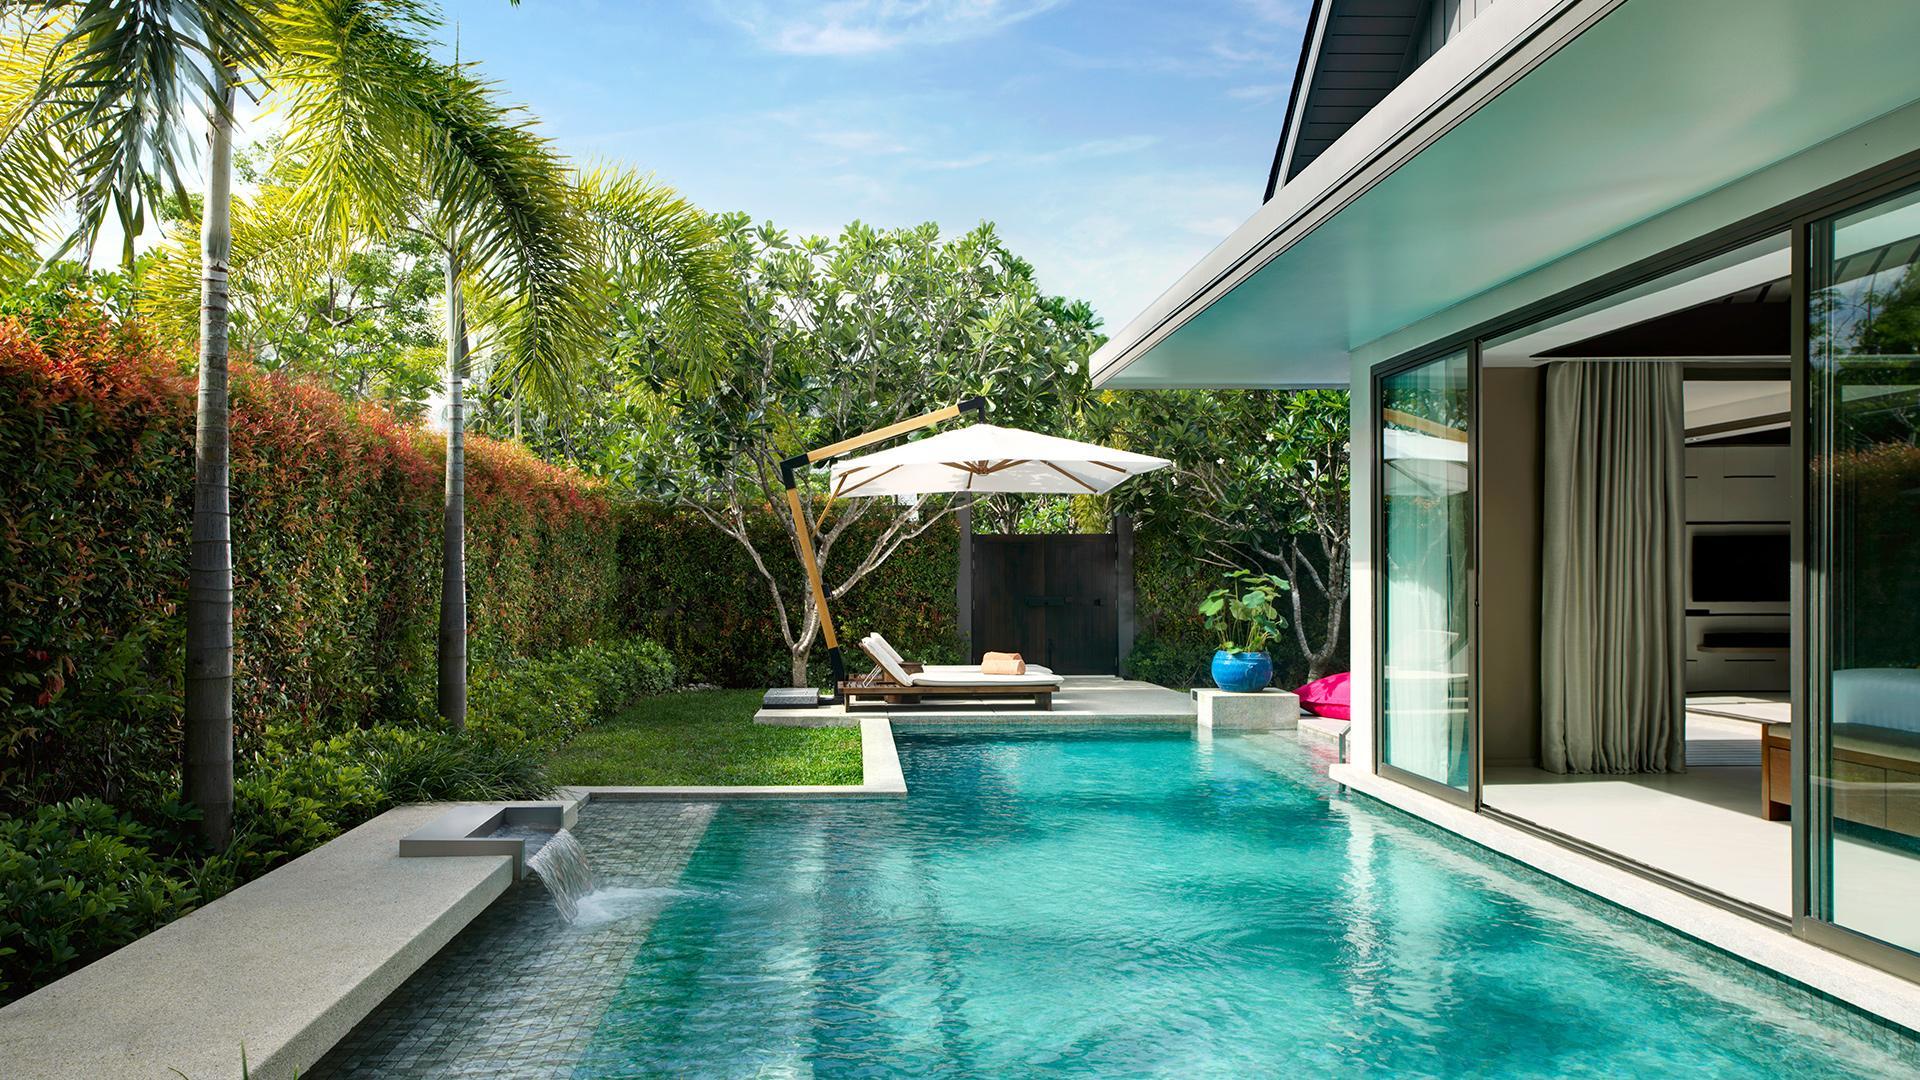 Grand Reserve Pool Villa image 1 at Santiburi Koh Samui by Amphoe Ko Samui, Surat Thani, Thailand